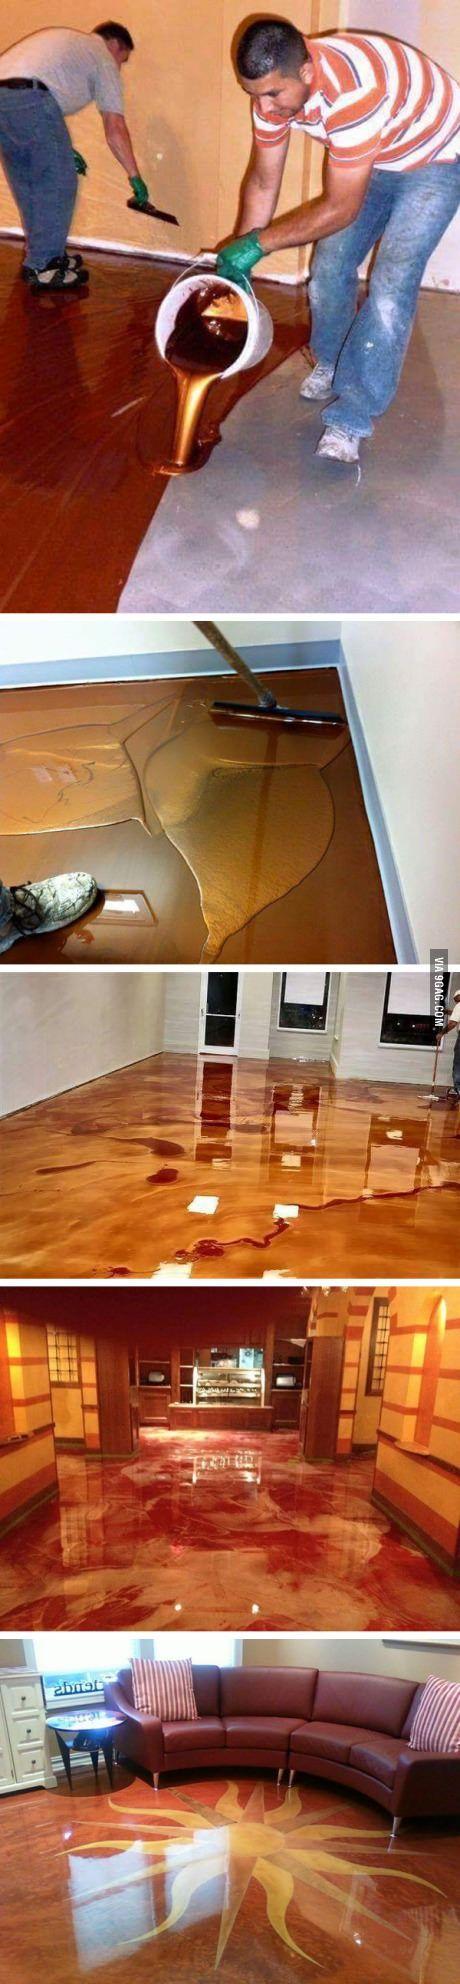 best 20+ epoxy floor basement ideas on pinterest | best garage